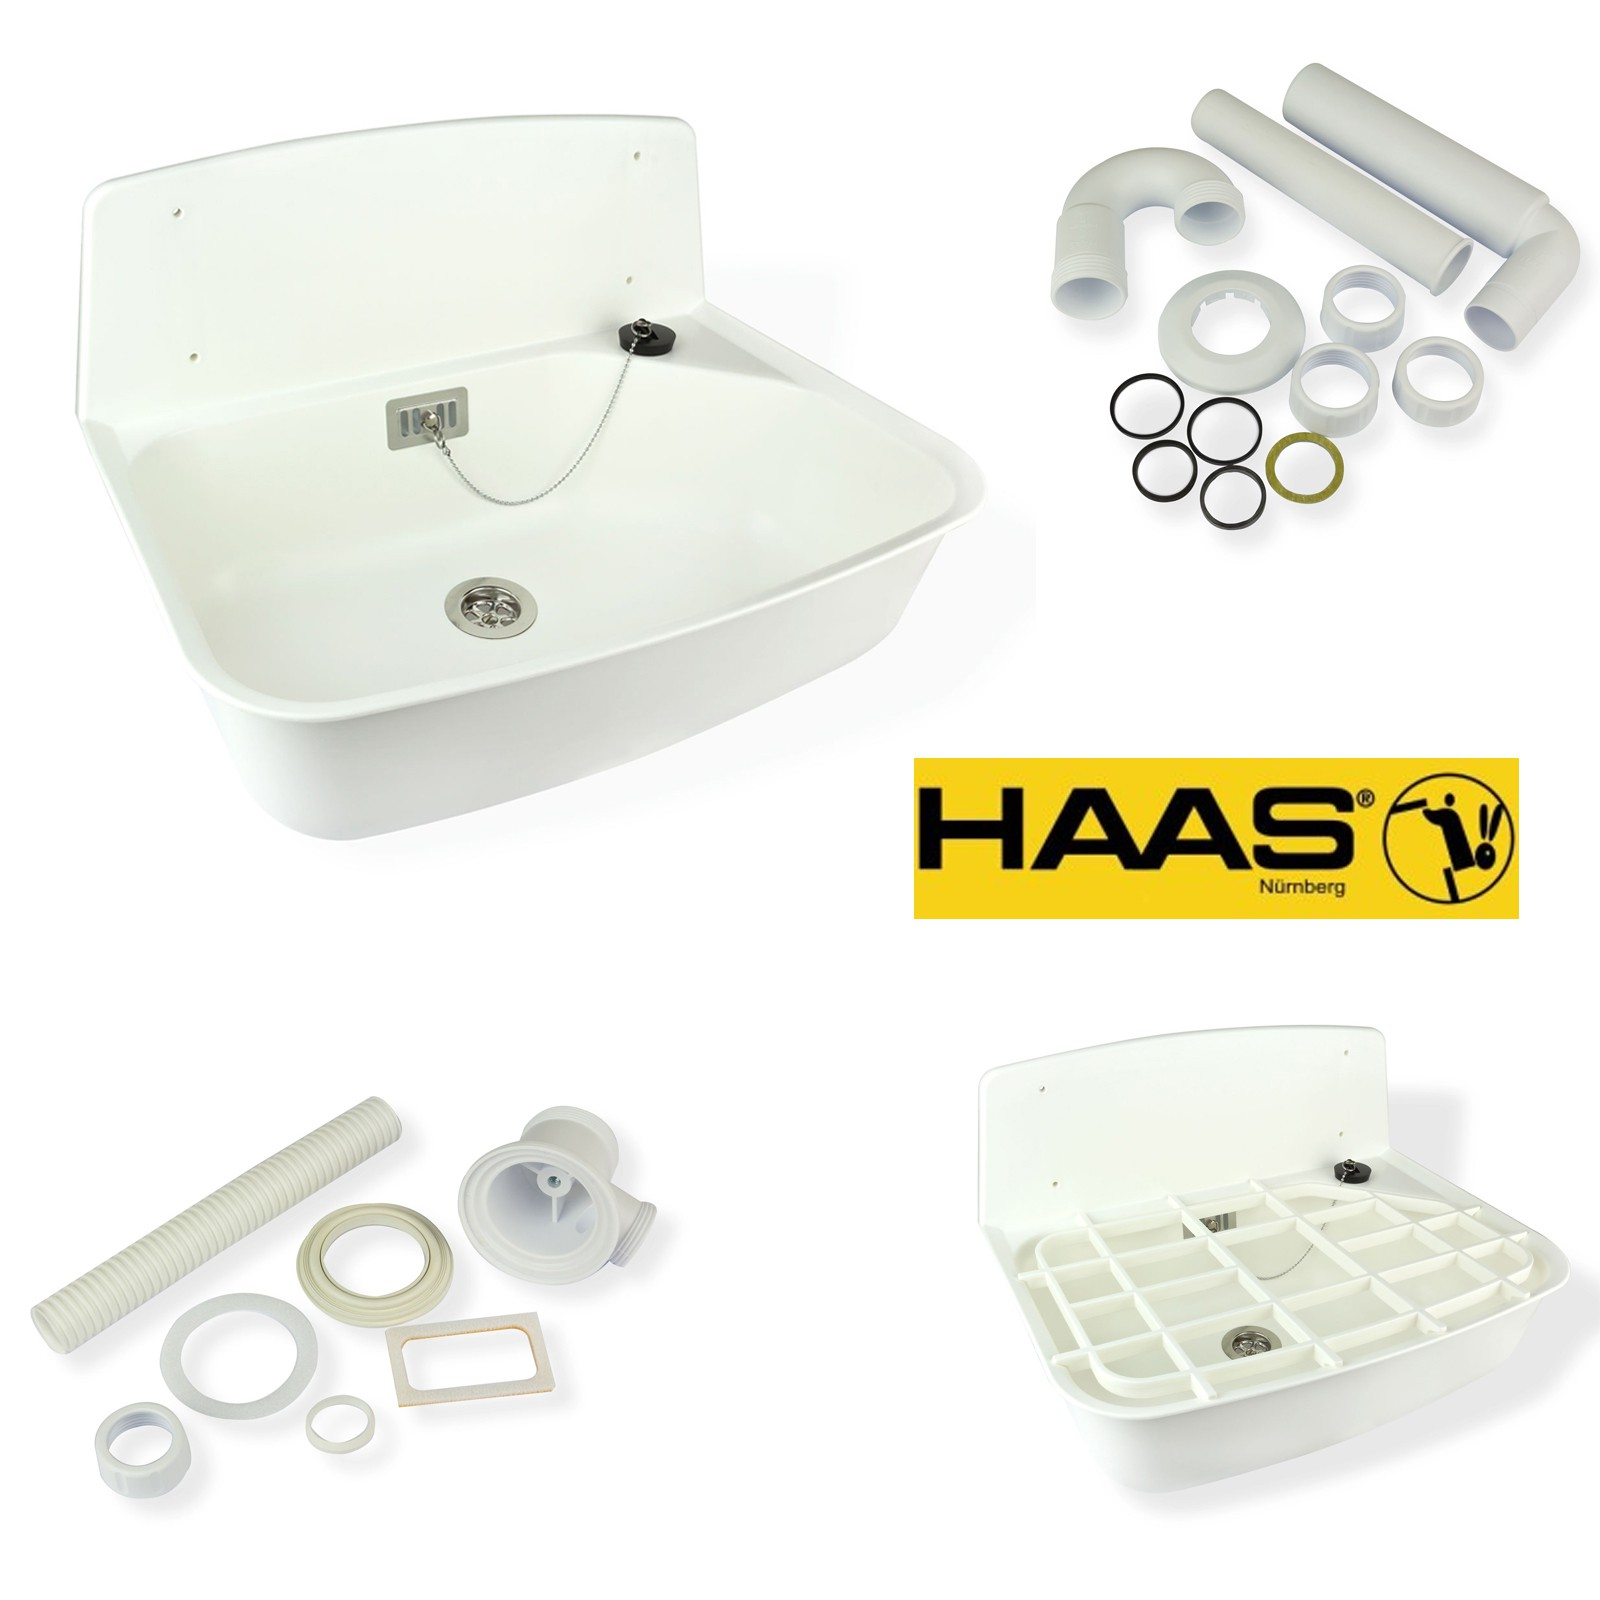 Haas kunststoff ausgussbecken set sophia waschtrog wei for Kunststoff waschbecken